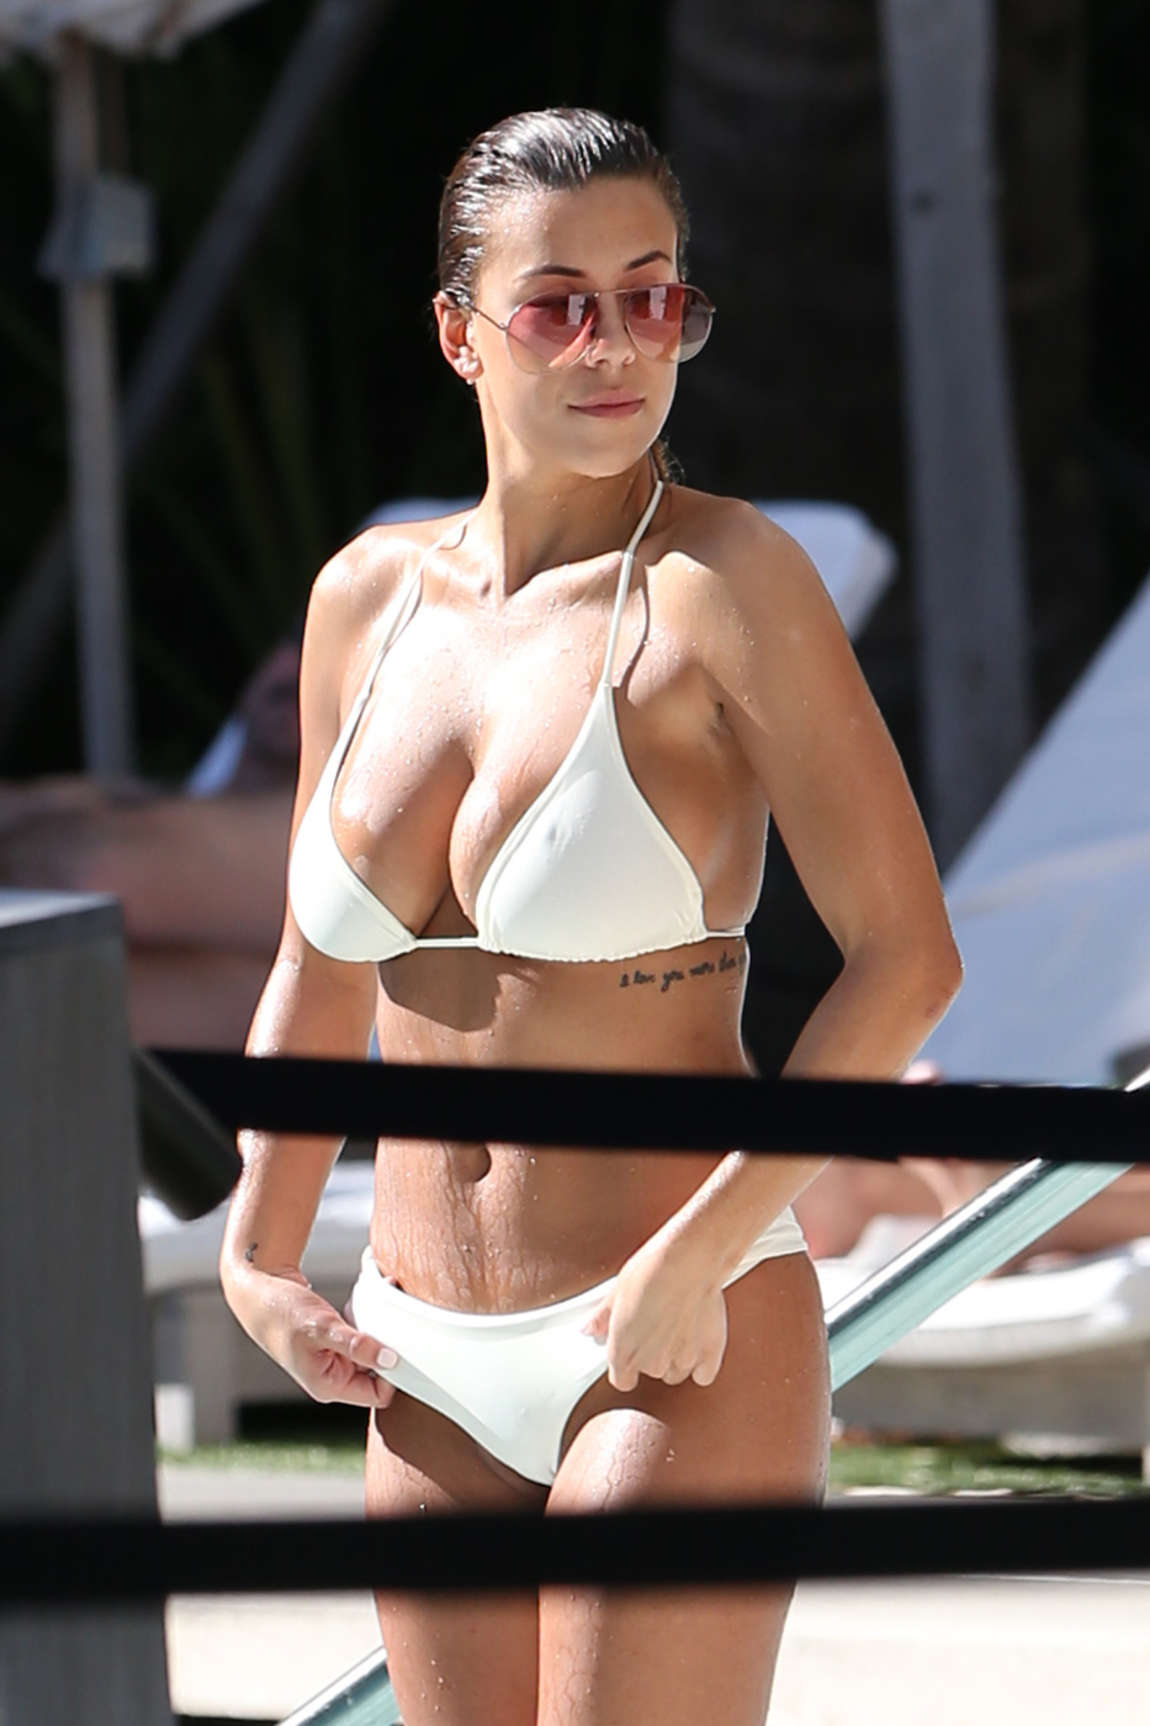 Anna Wolf Naked. 2018-2019 celebrityes photos leaks! XXX clips Stella maxwell sarah brannon sexy 7 Photos,Bella hadid nude 7 Photos